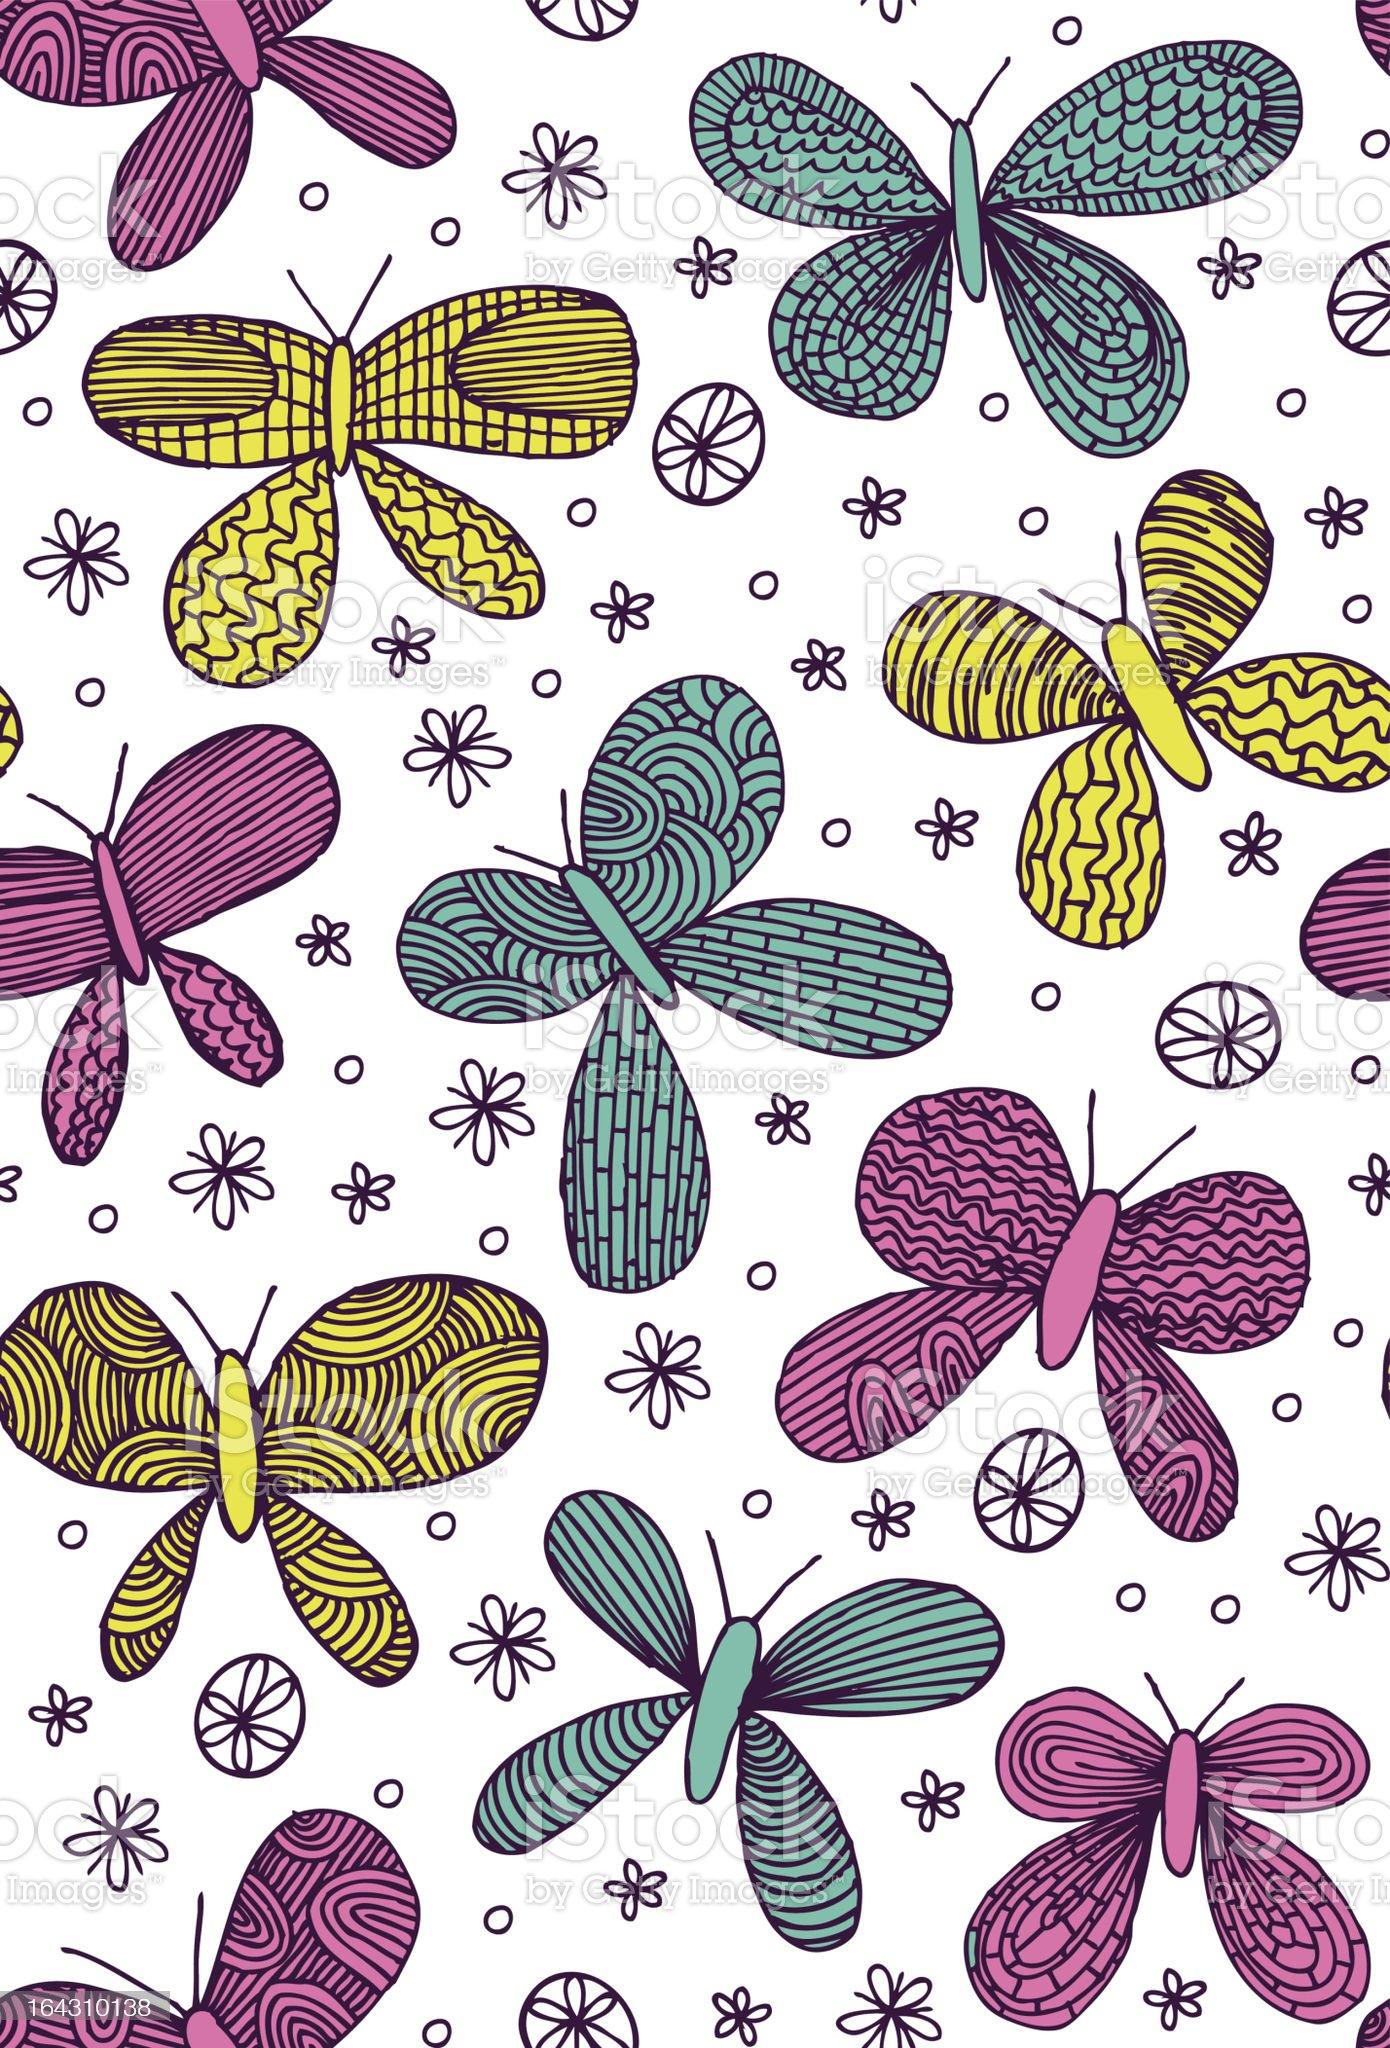 Cosmic Butterflies Seamless Pattern royalty-free stock vector art